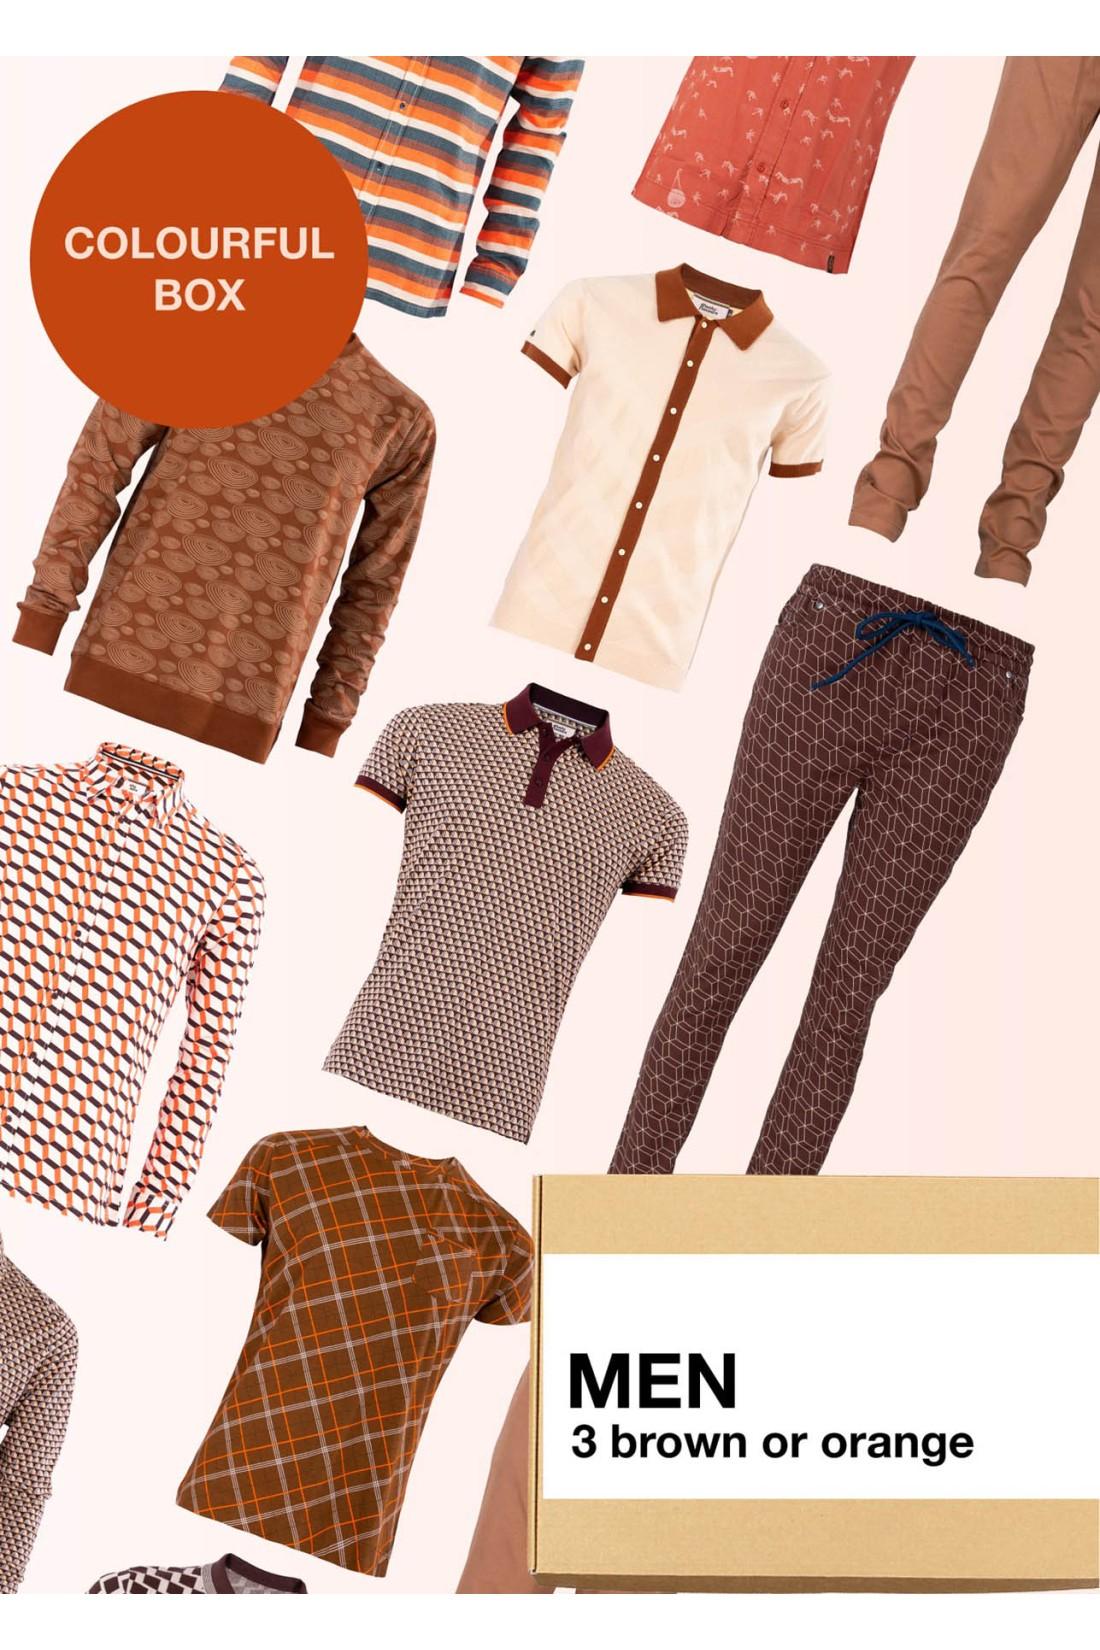 Surprise Box Men - Brown Orange Box 3 Styles With Brown Or Orange In It